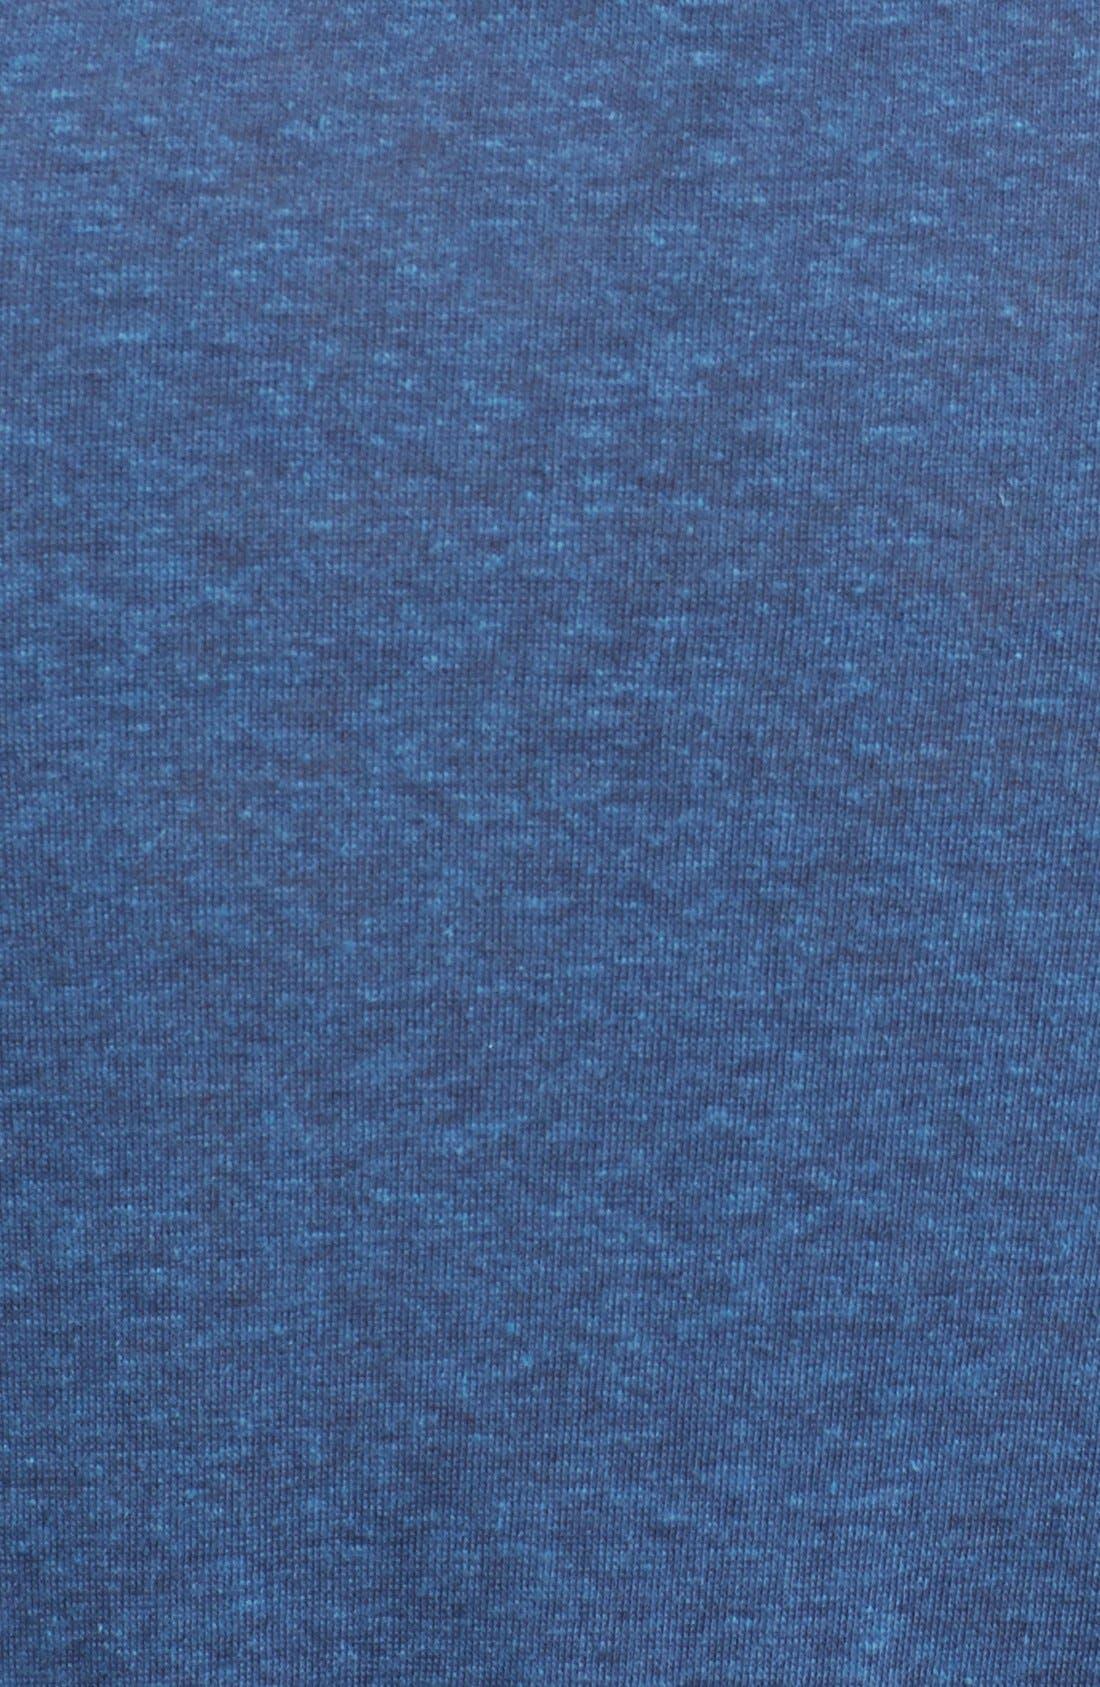 Alternate Image 3  - Vince Camuto Slim Fit Knit Henley